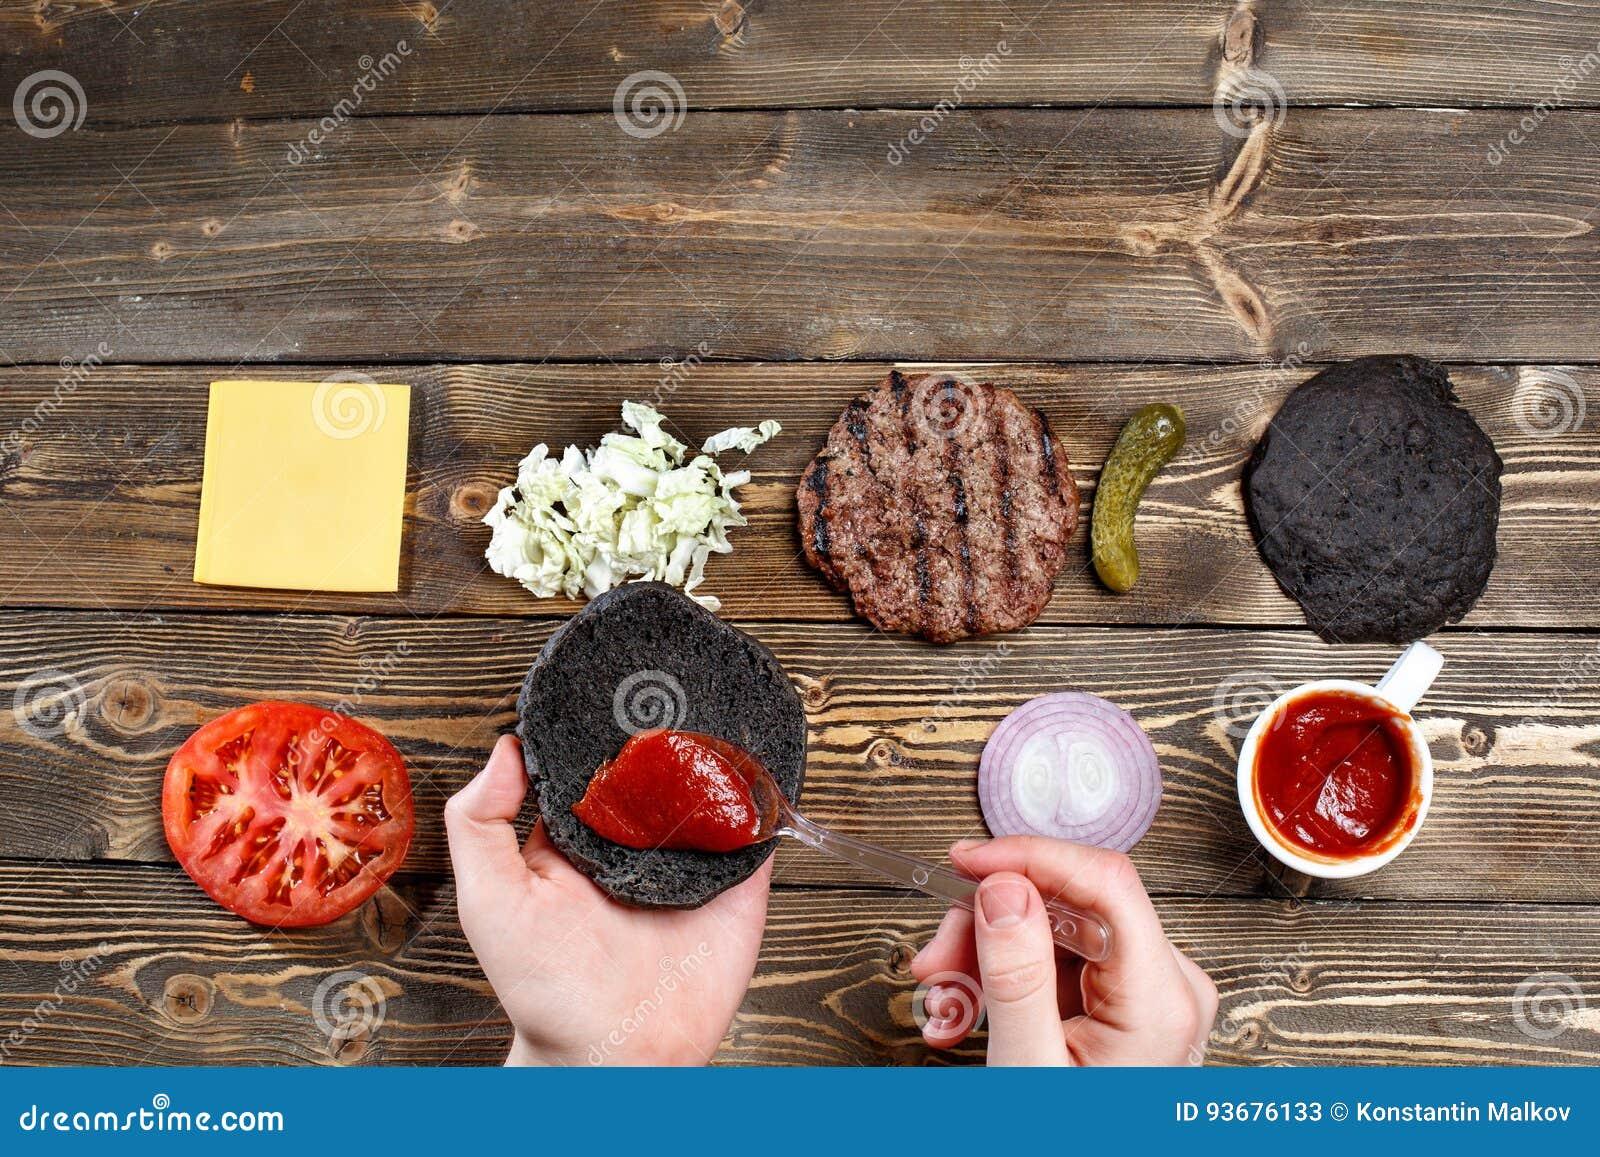 Las Manos Para Aumentar La Hamburguesa, Separaron La Salsa De Tomate ...